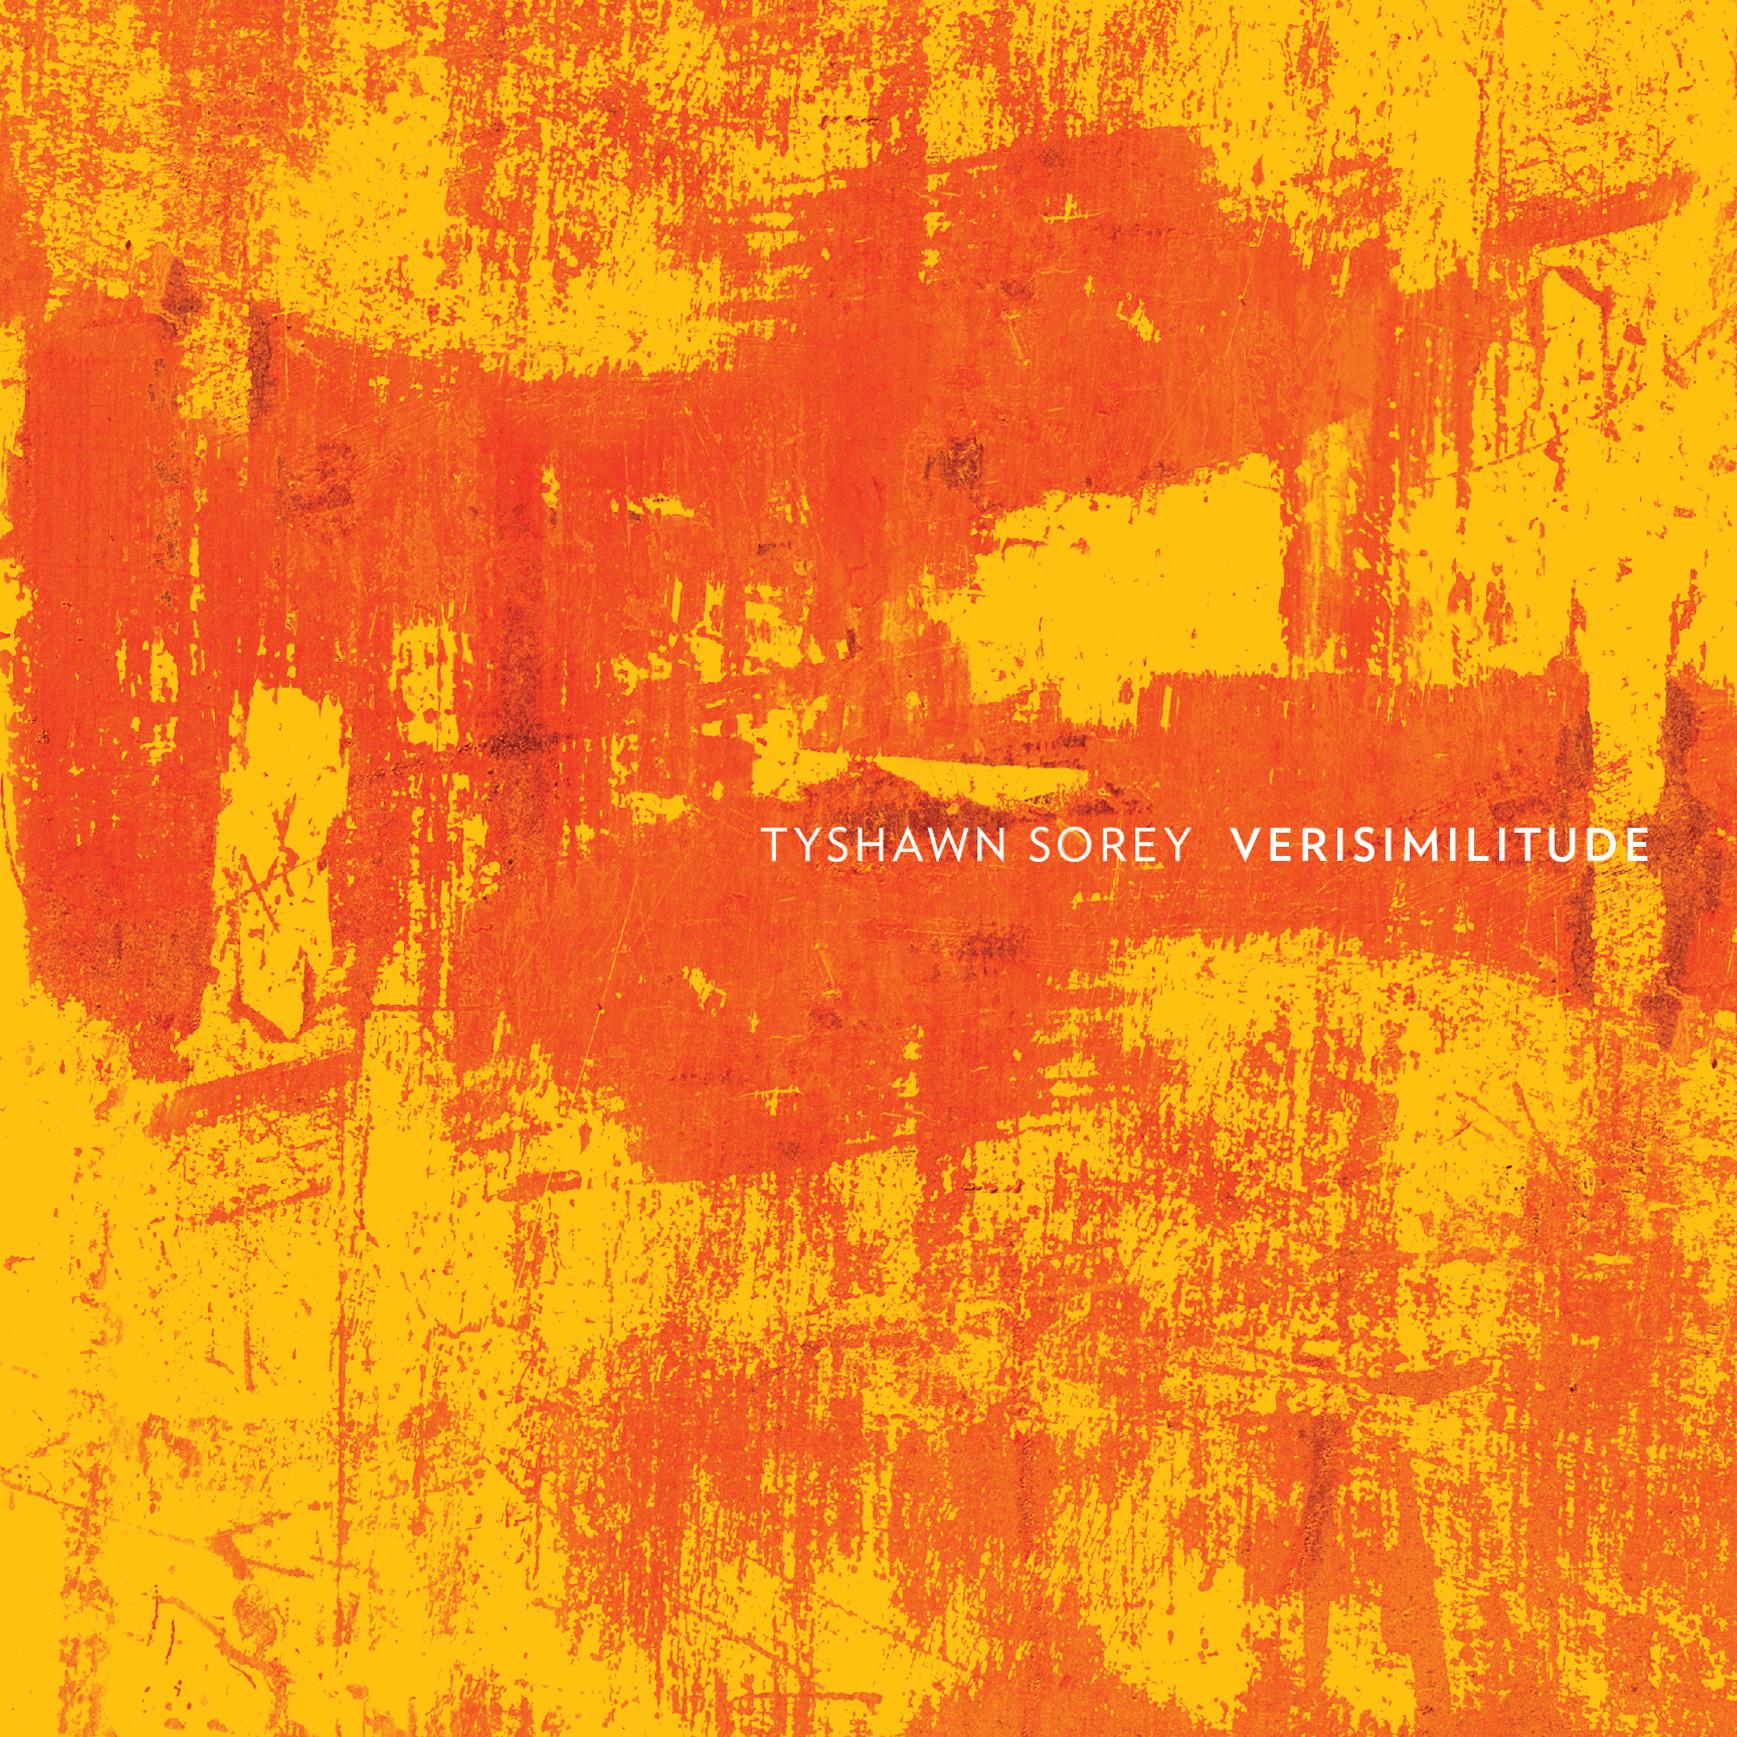 Verisimilitude - Tyshawn Sorey